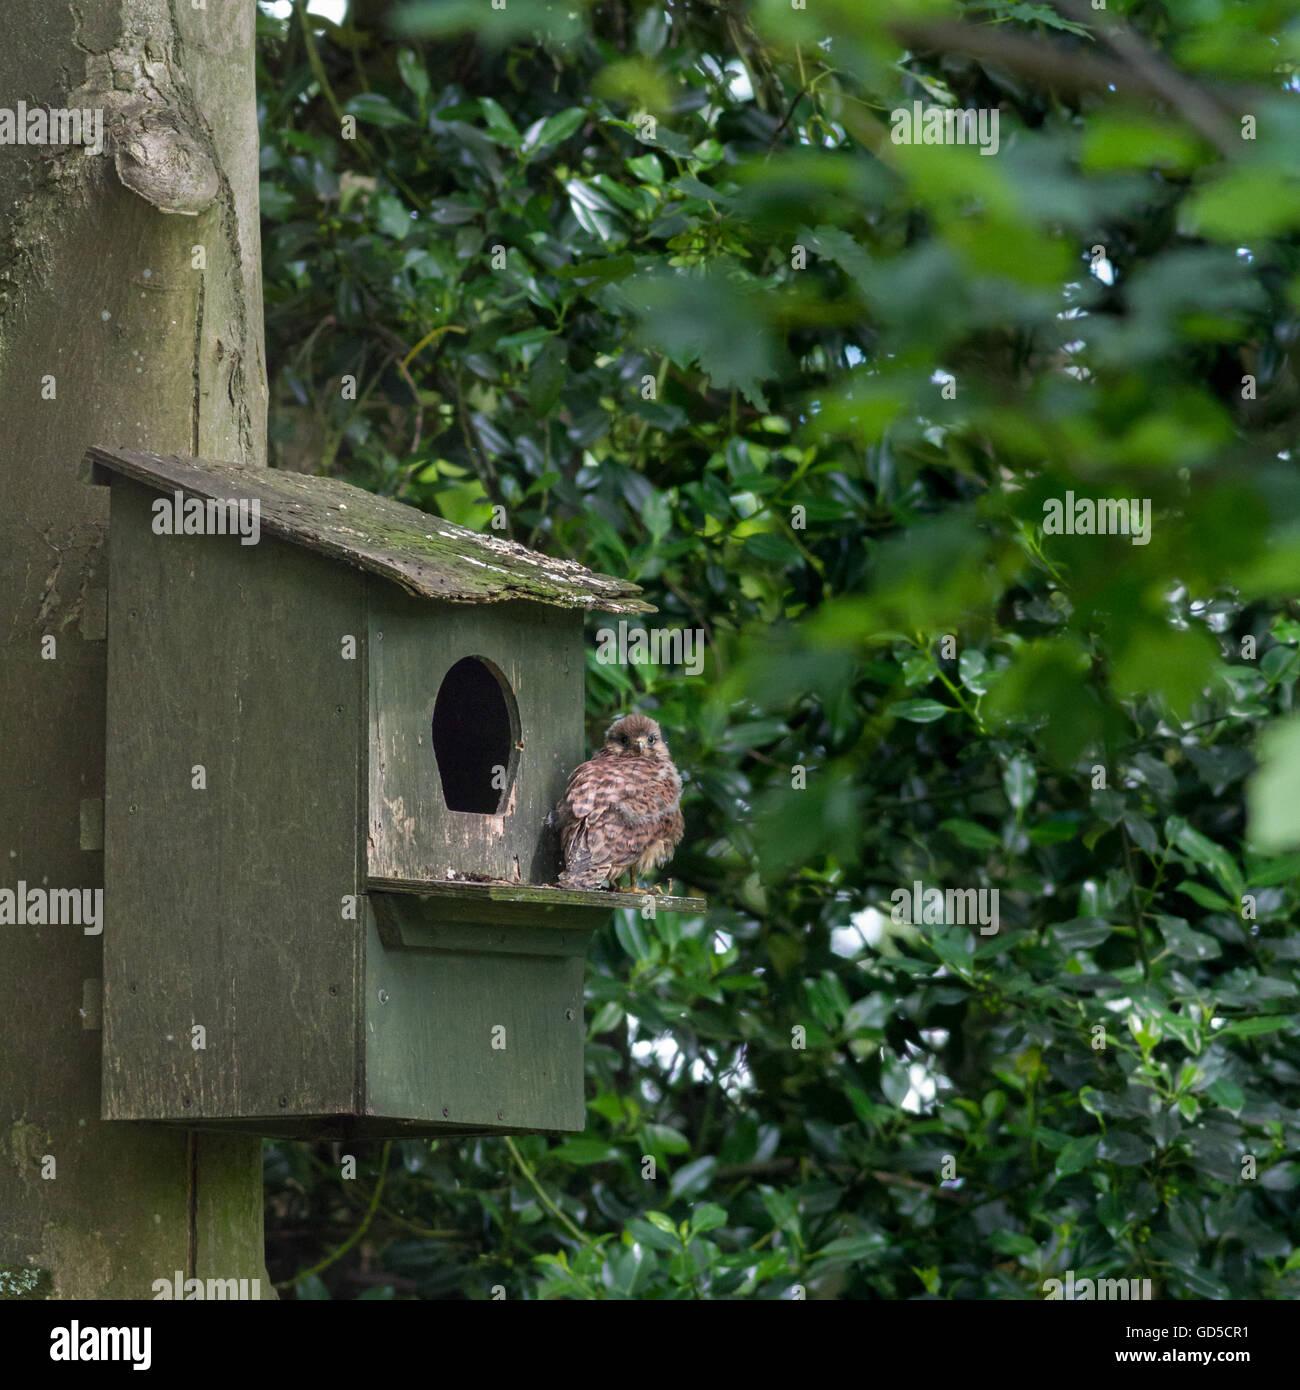 Fledgling kestrel (Falco tinnunculus) perched outside a nesting box - Stock Image